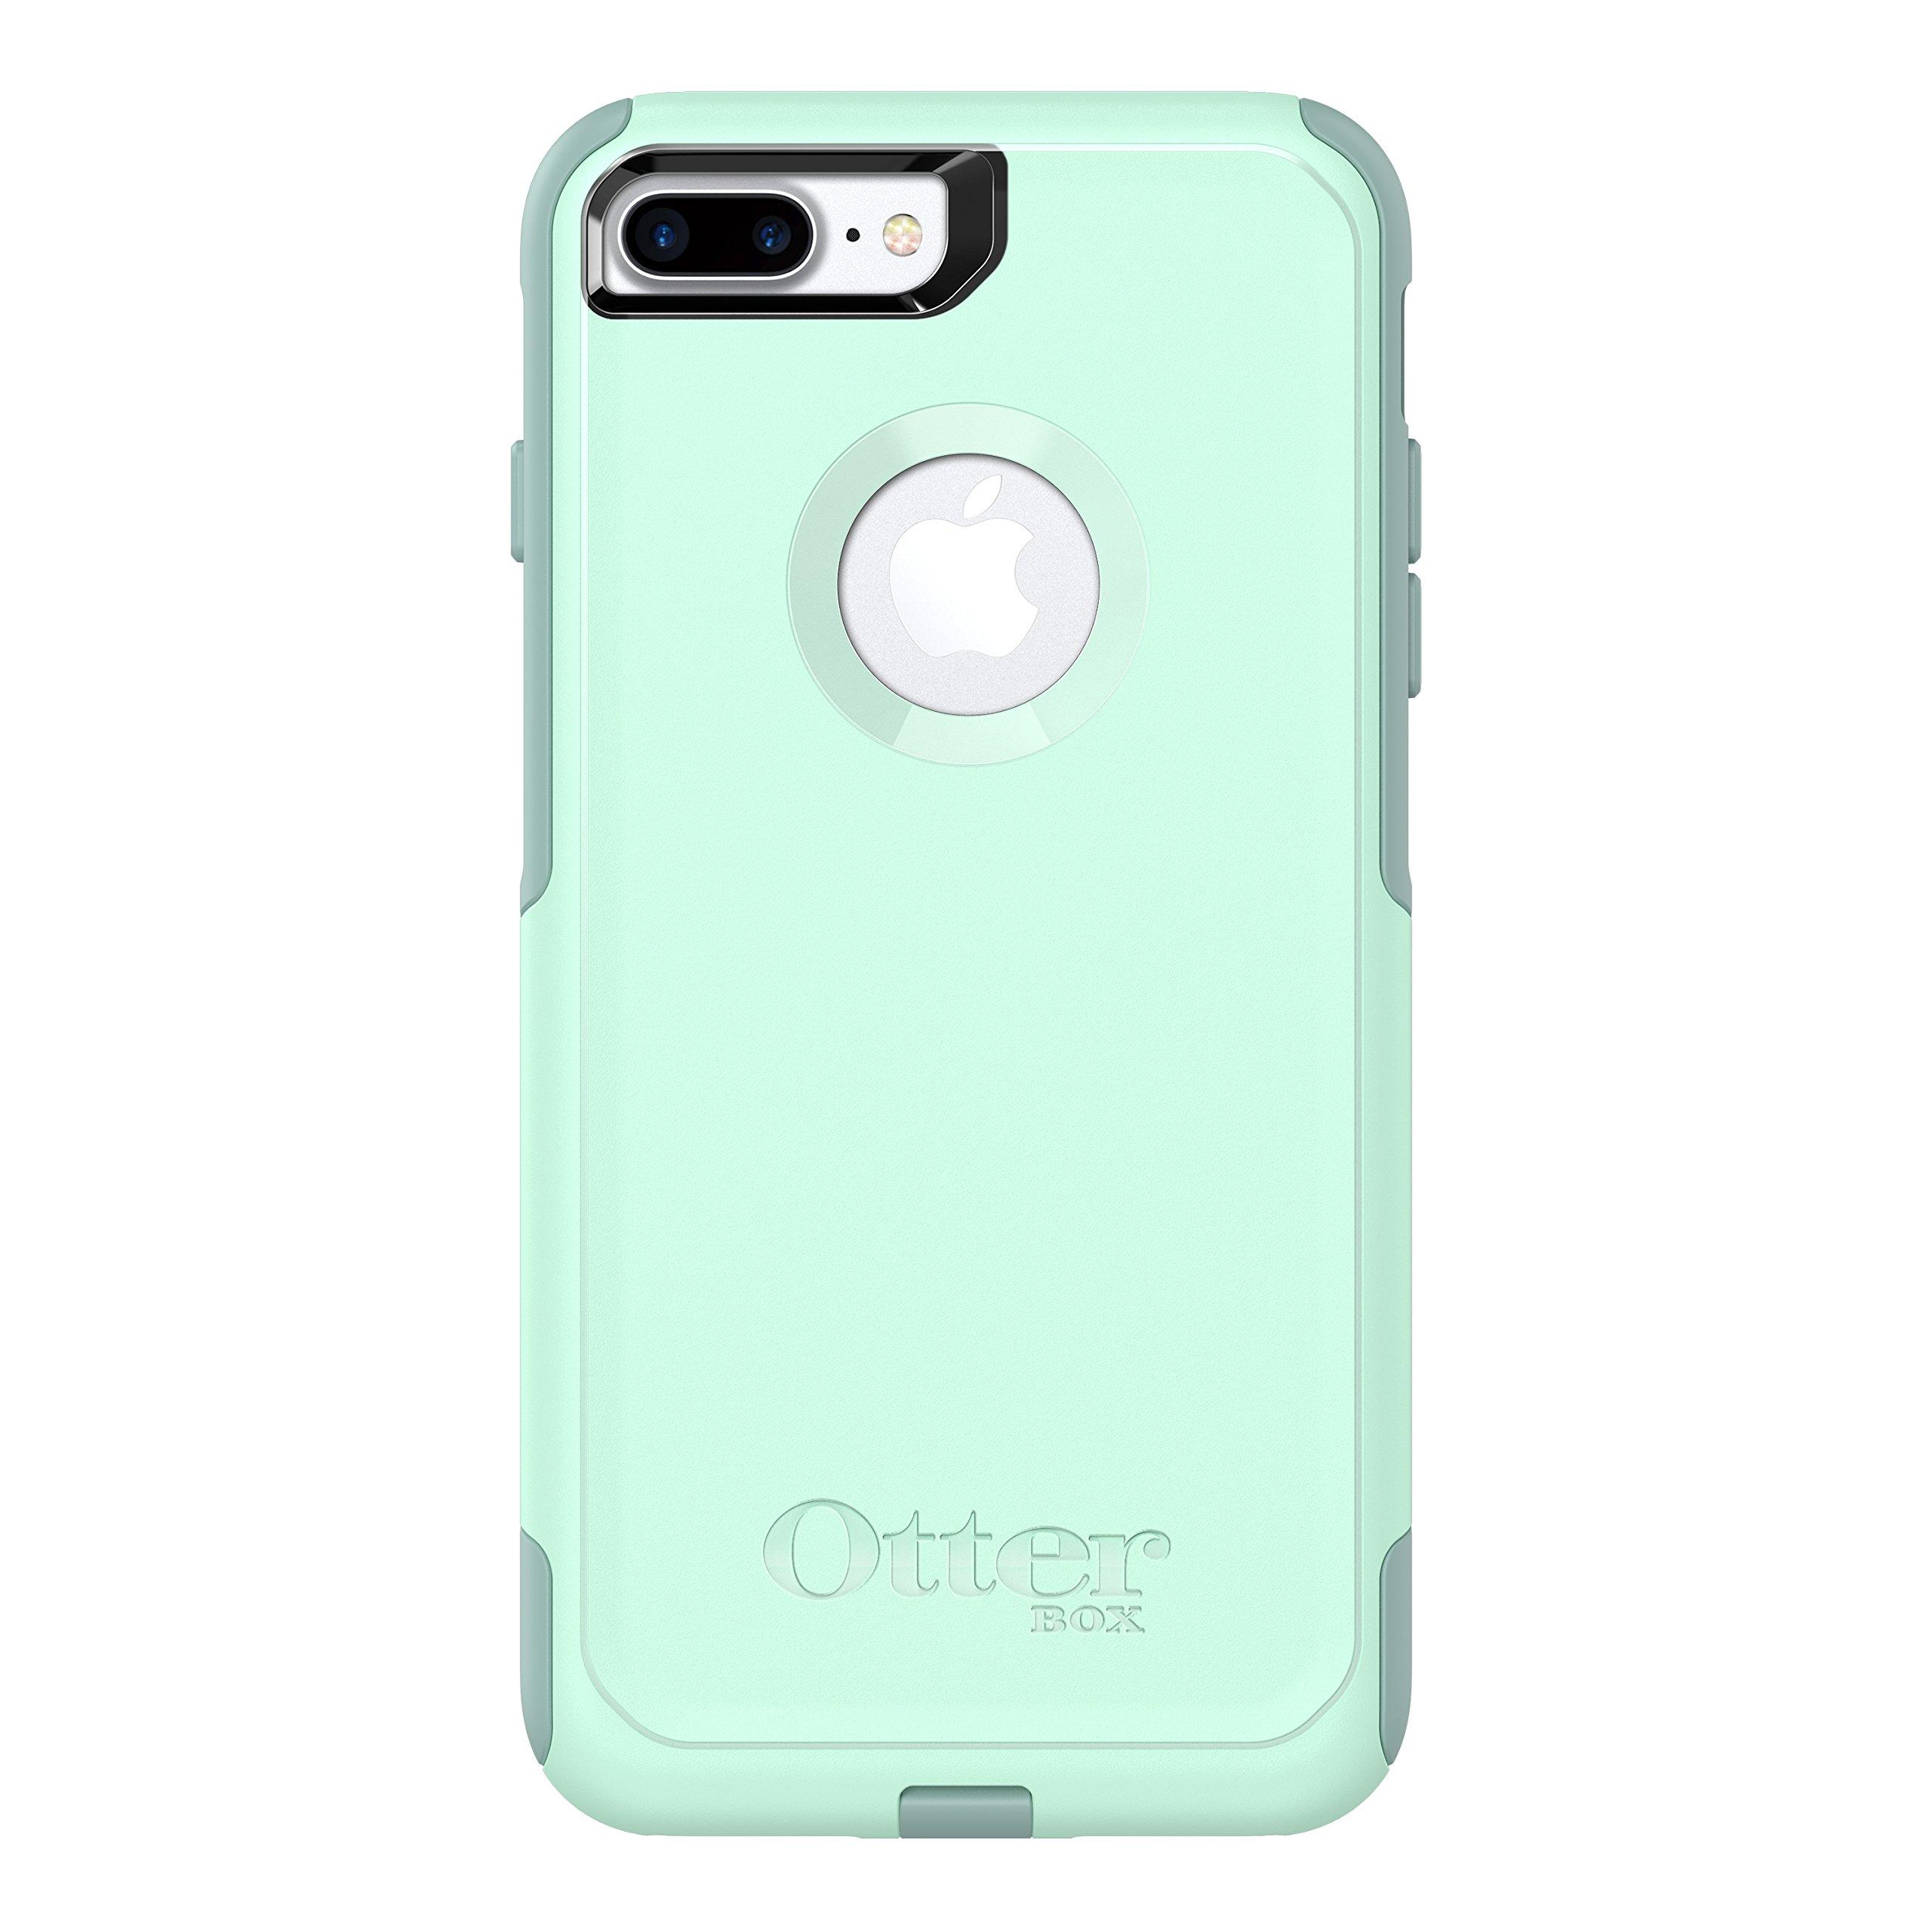 Otterbox Commuter Series Case for  Iphone 8 Plus & Iphone 7 Plus  - Retail Packaging - Ocean Way (Aqua Sail/Aquifer)